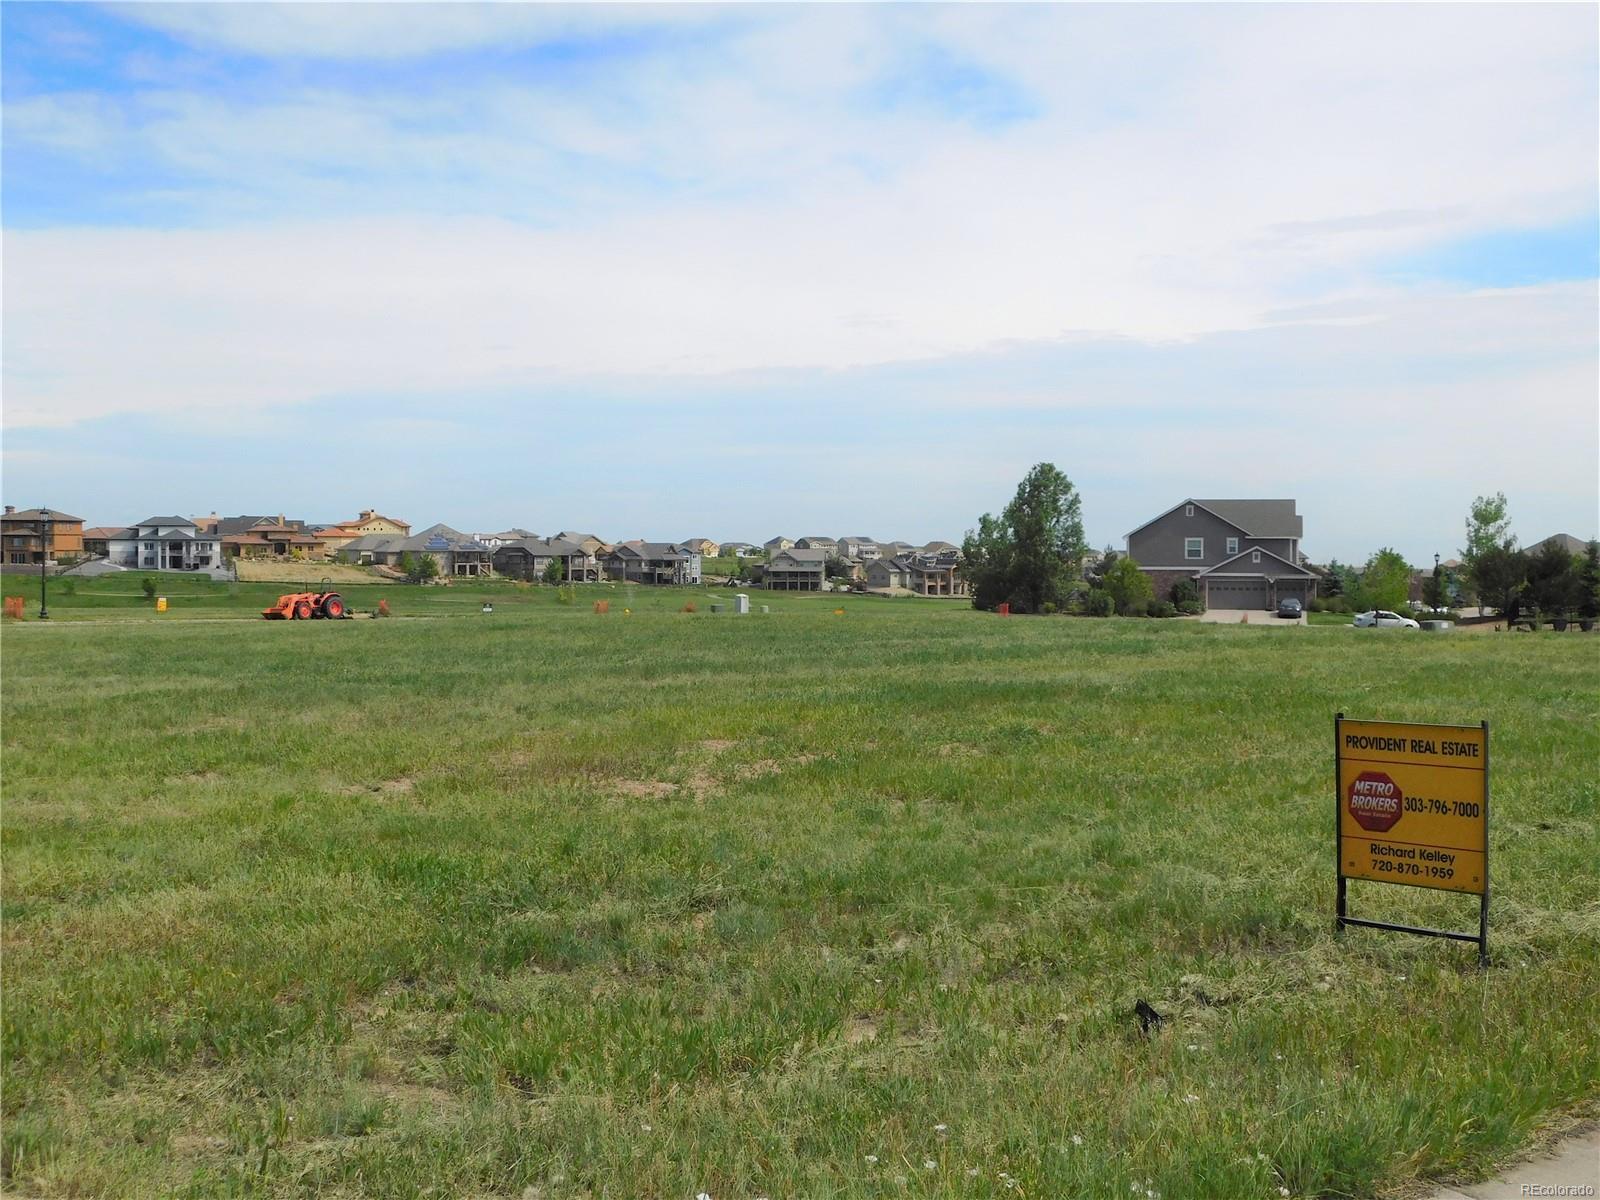 8099 S Blackstone Parkway, Aurora, CO 80016 - Aurora, CO real estate listing